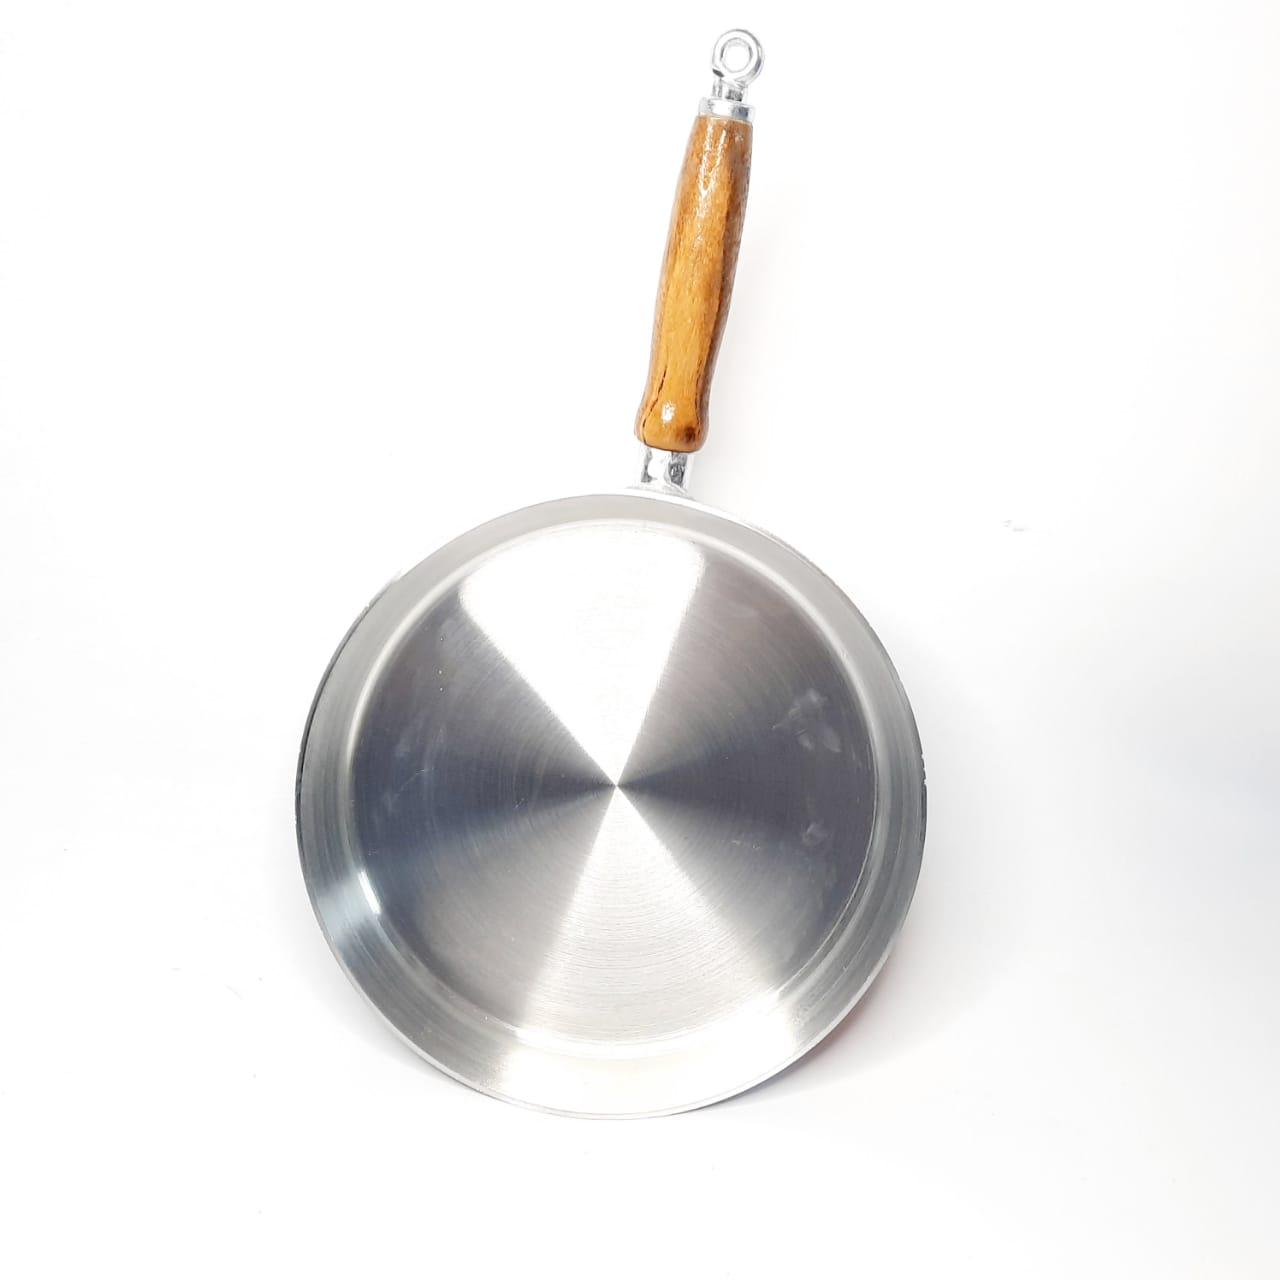 Frigideira Alumínio Fundido N 24 Arara